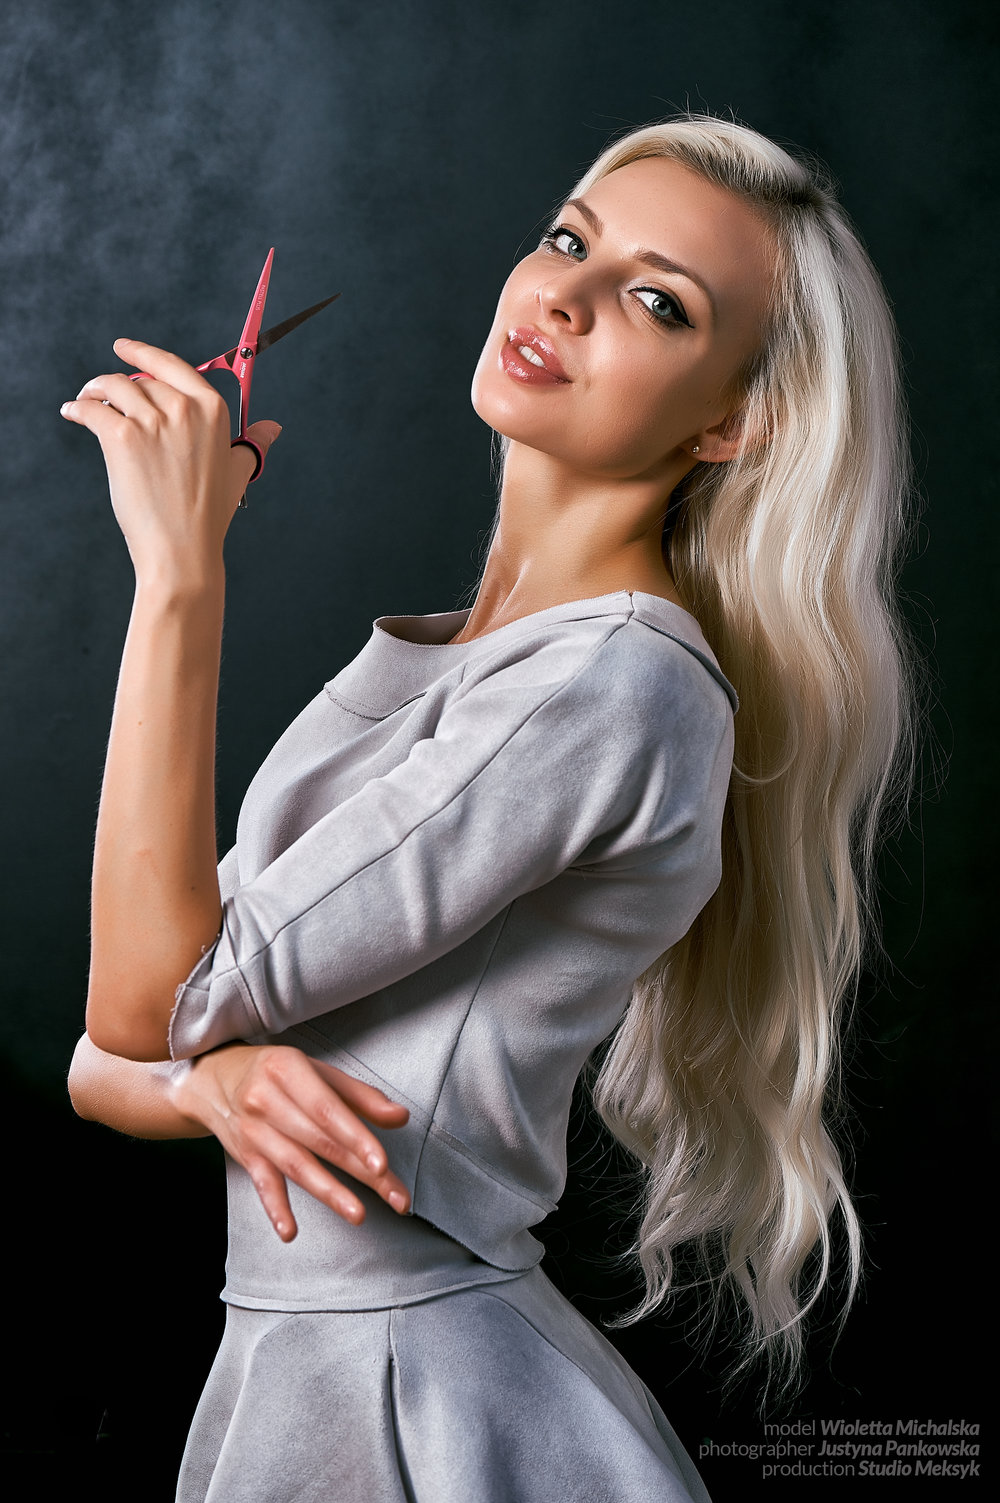 , Wioletta Michalska, portrait, blonde, hairstyle, makeup, natural,  beauty, girl, hot, sexy, sensual, photo, peaple, phoptography, Justyna Pankowska, Studio Meksyk,,nożyczki, mniejszeor.jpg